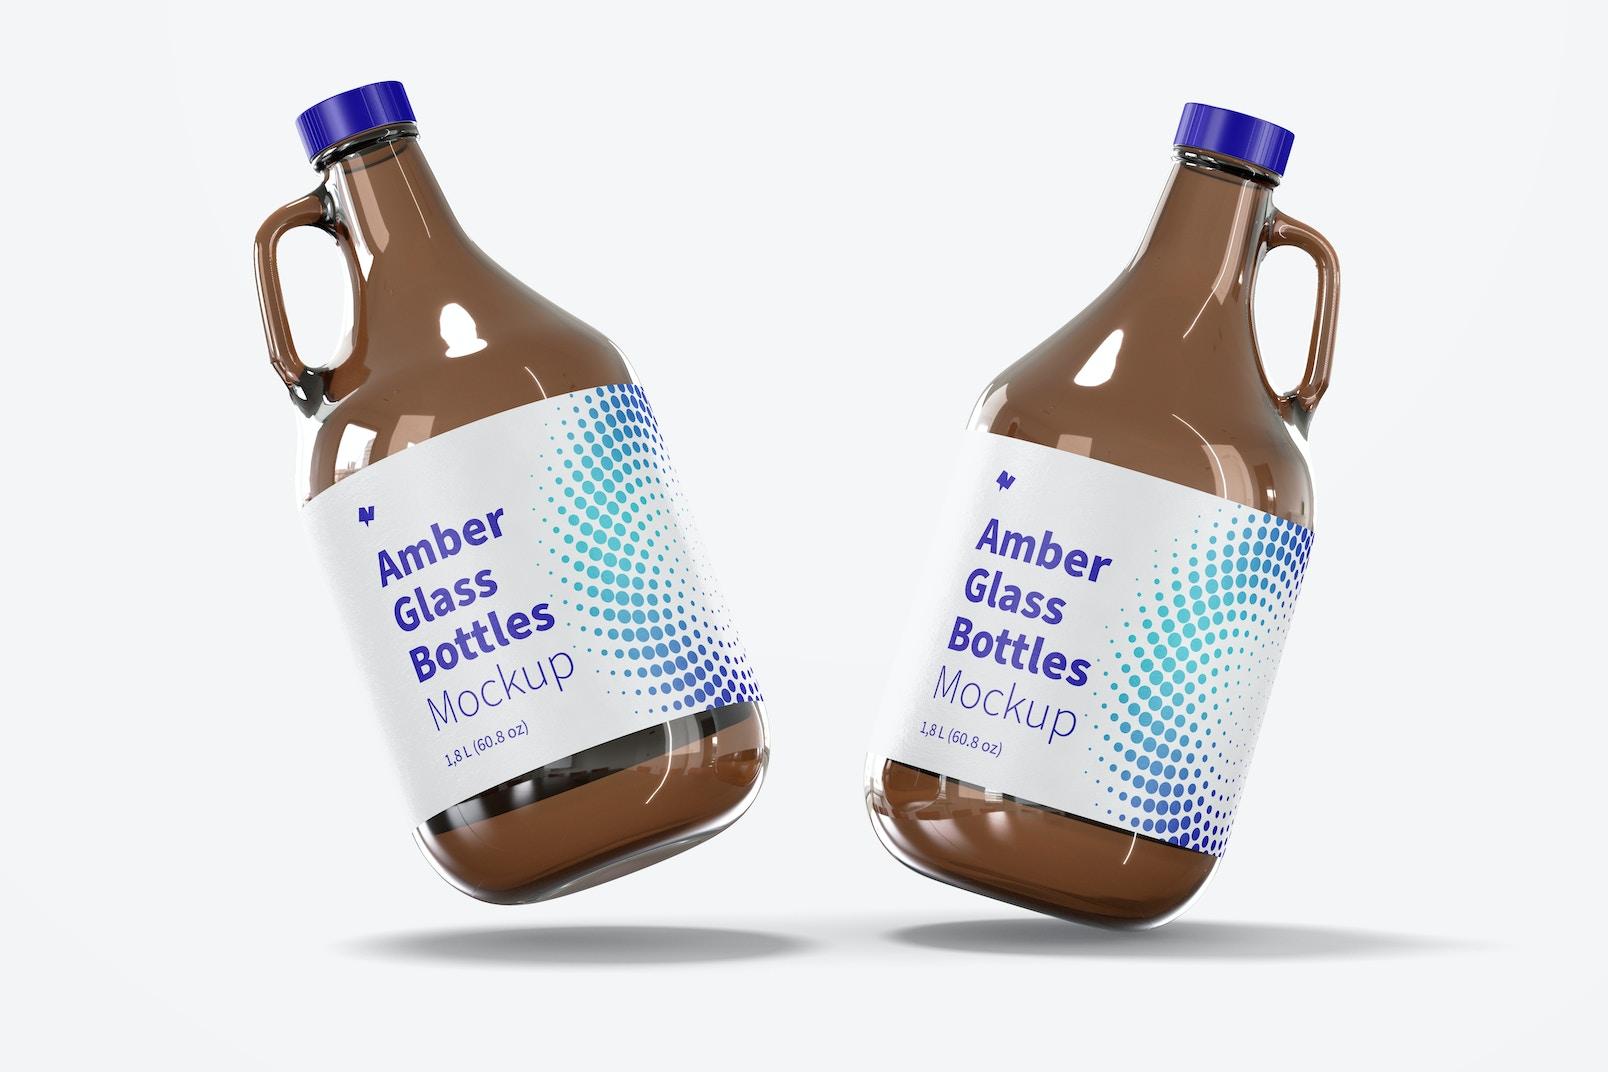 Amber Glass Bottles with Handle Jar Mockup, Falling